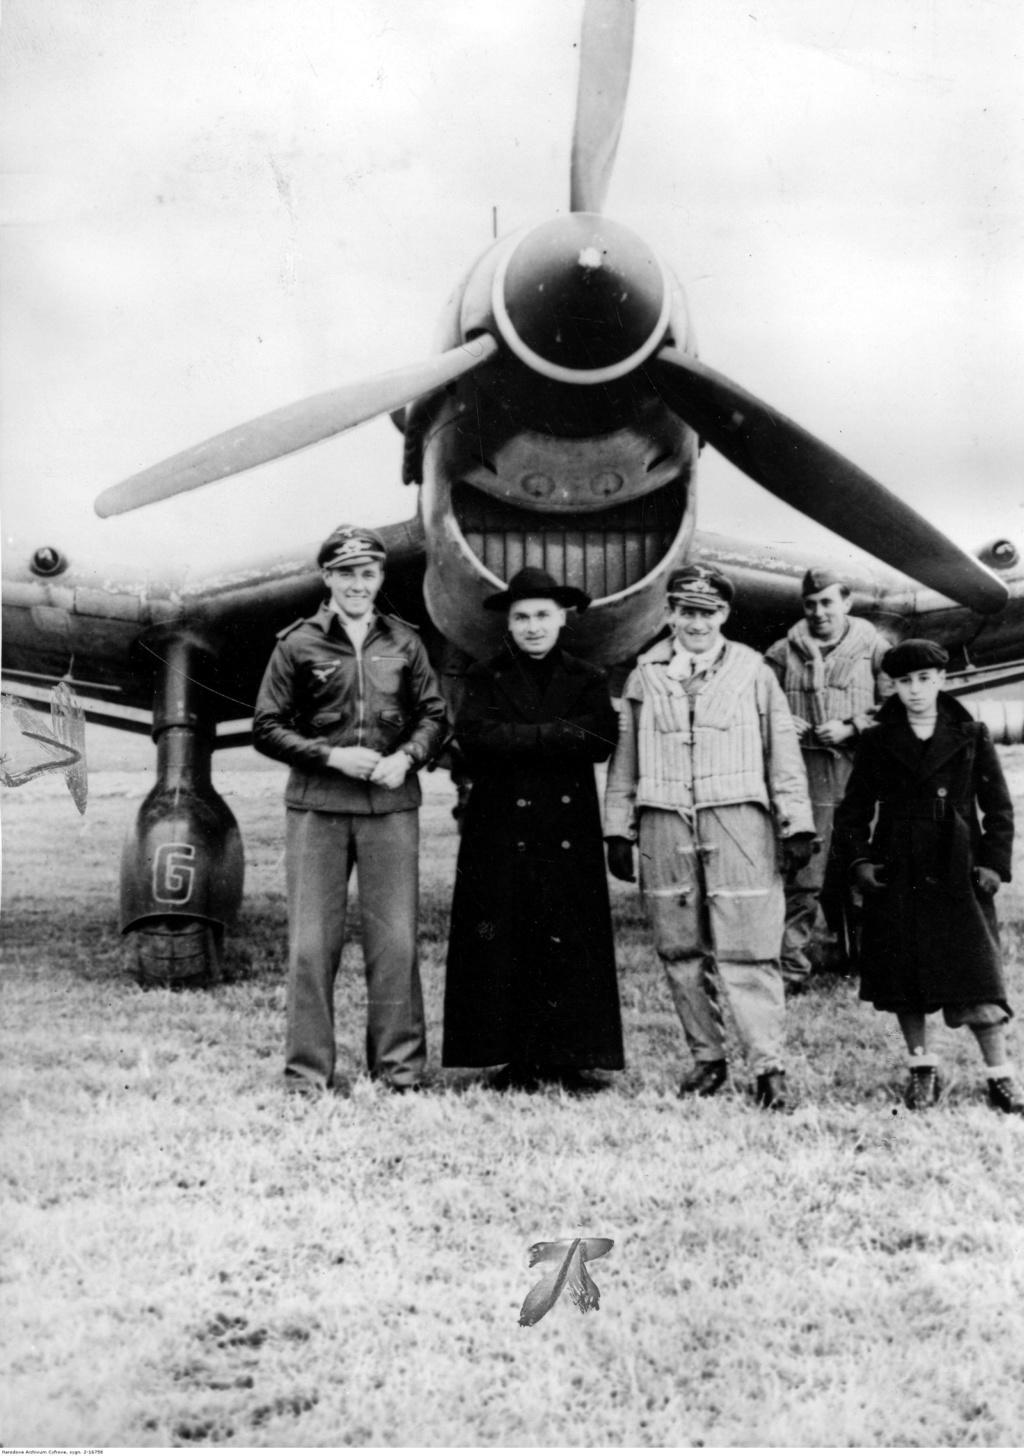 Diverses photos de la WWII - Page 5 91018